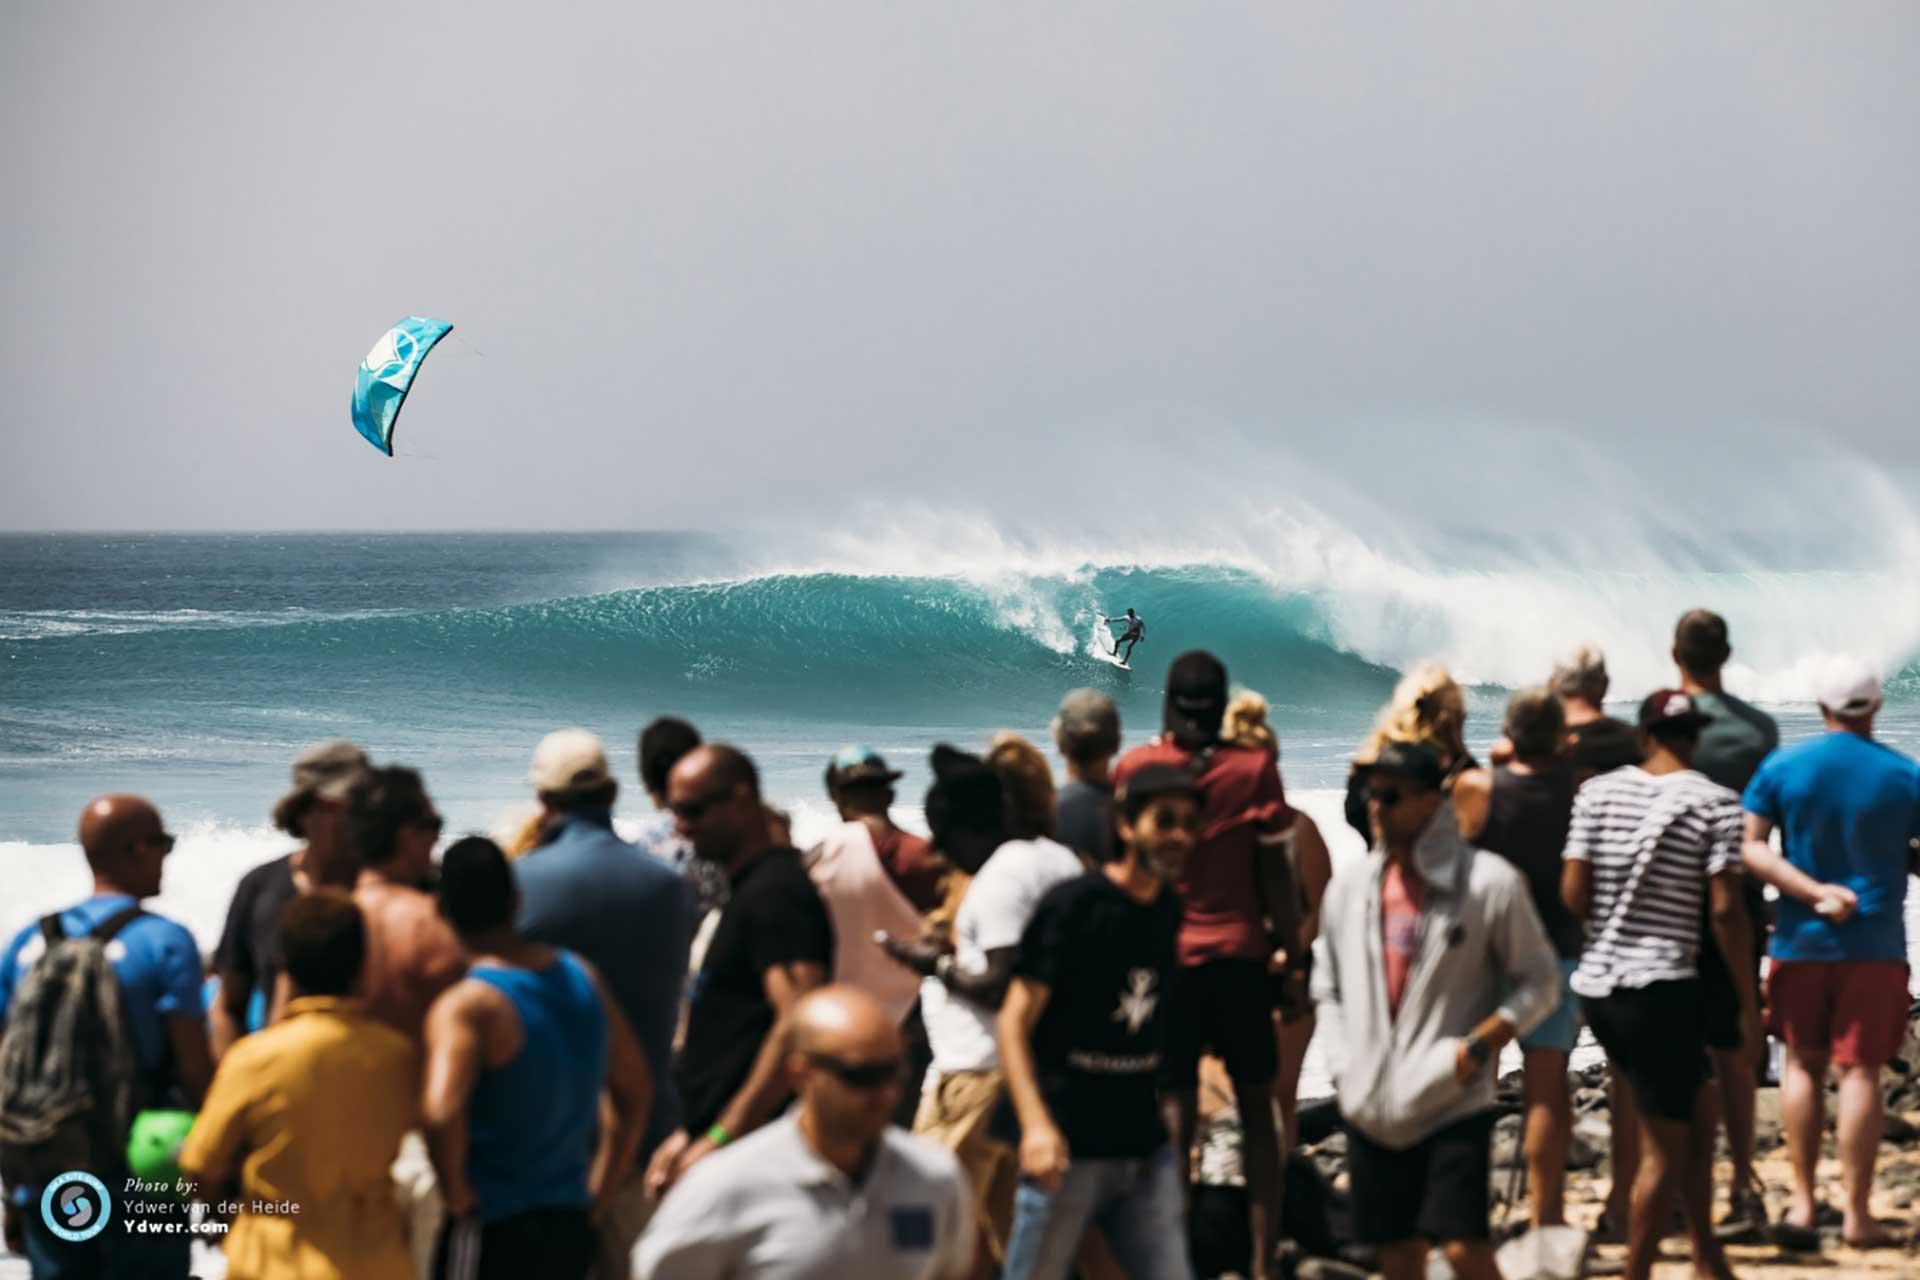 GKA Kite Surf World Cup